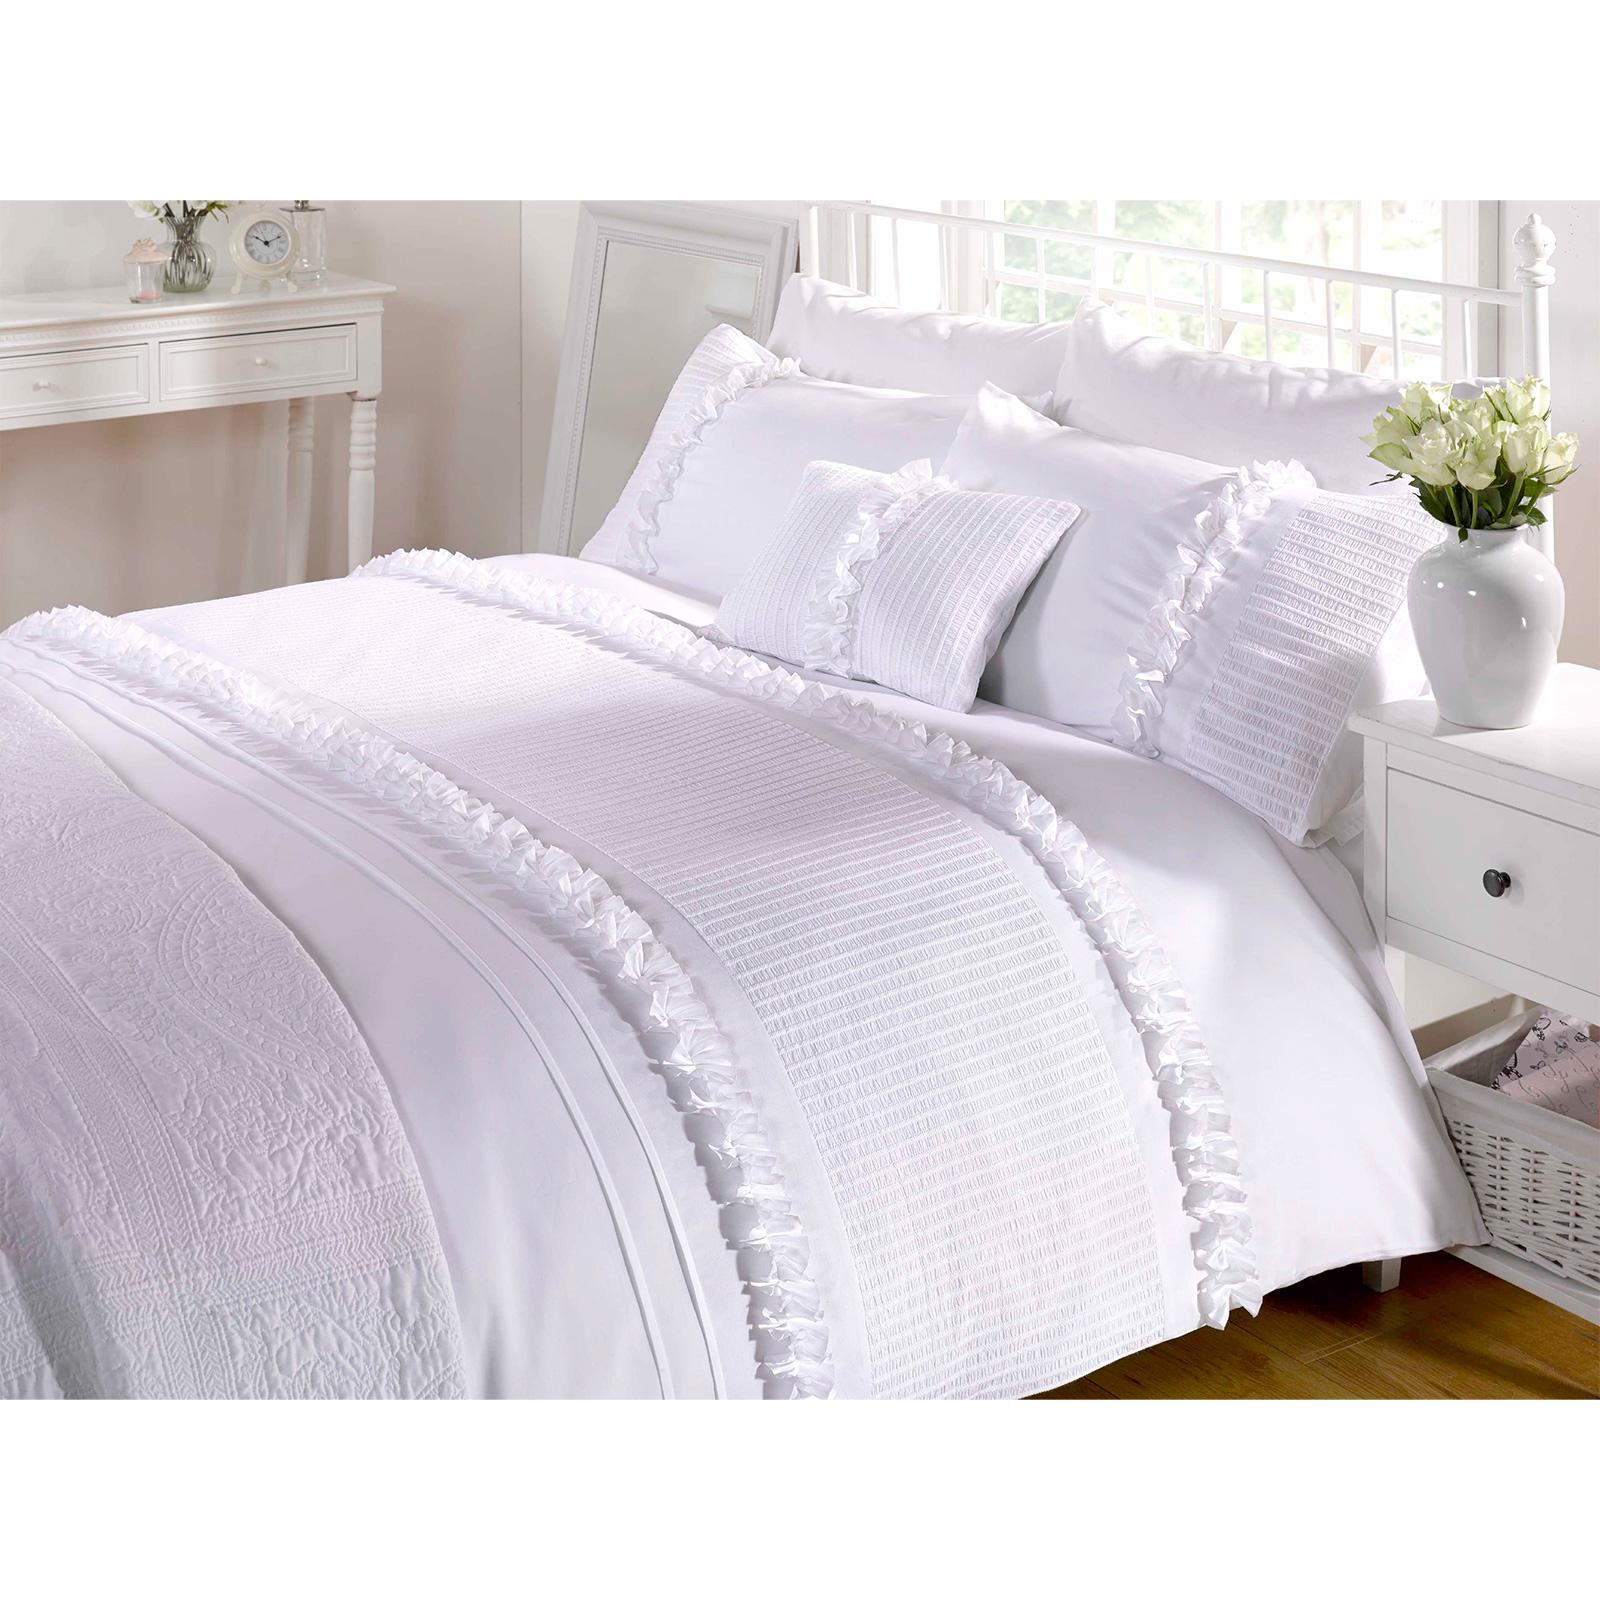 vintage chic ruffle duvet quilt cover seersucker bedding